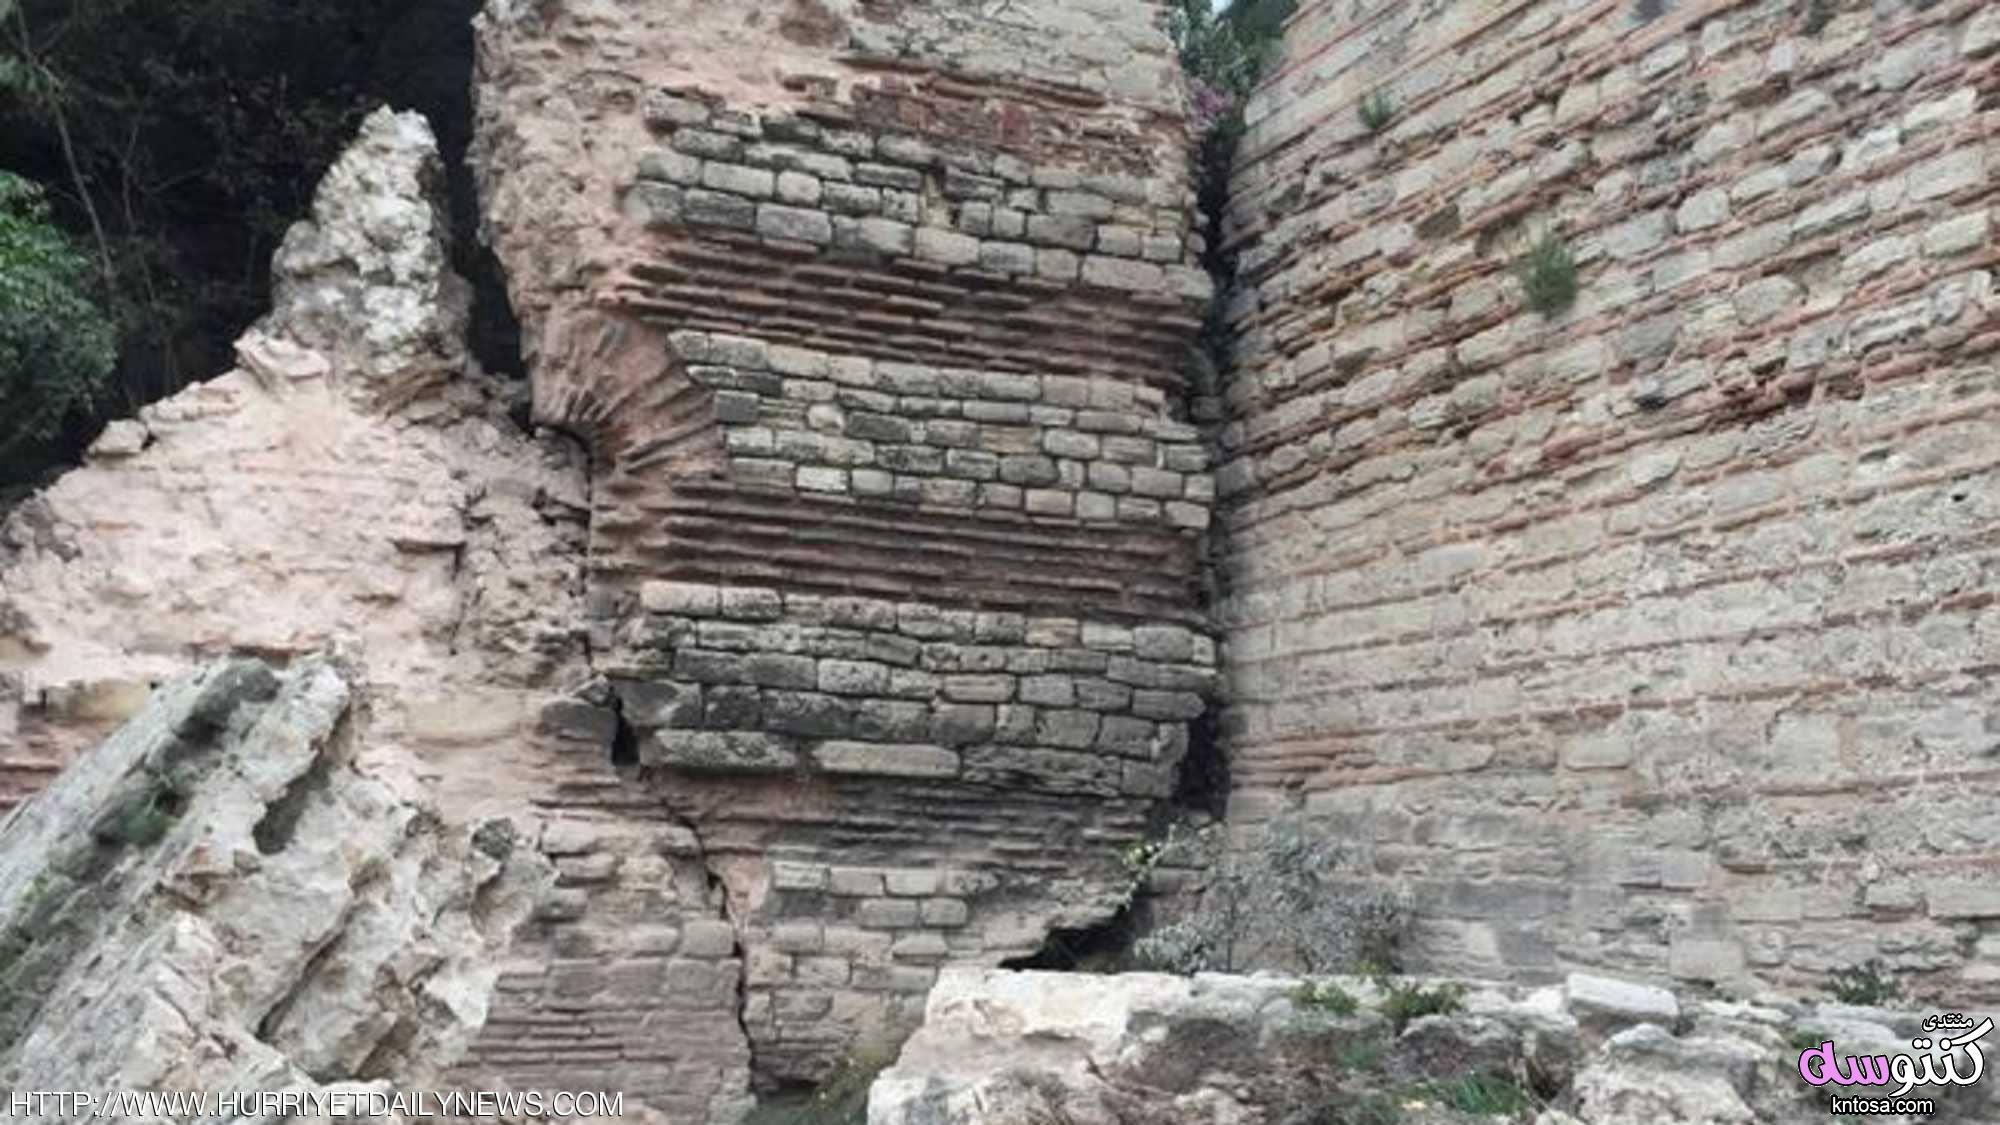 بالصور.. انهيار معلم تاريخي في إسطنبول kntosa.com_17_18_153